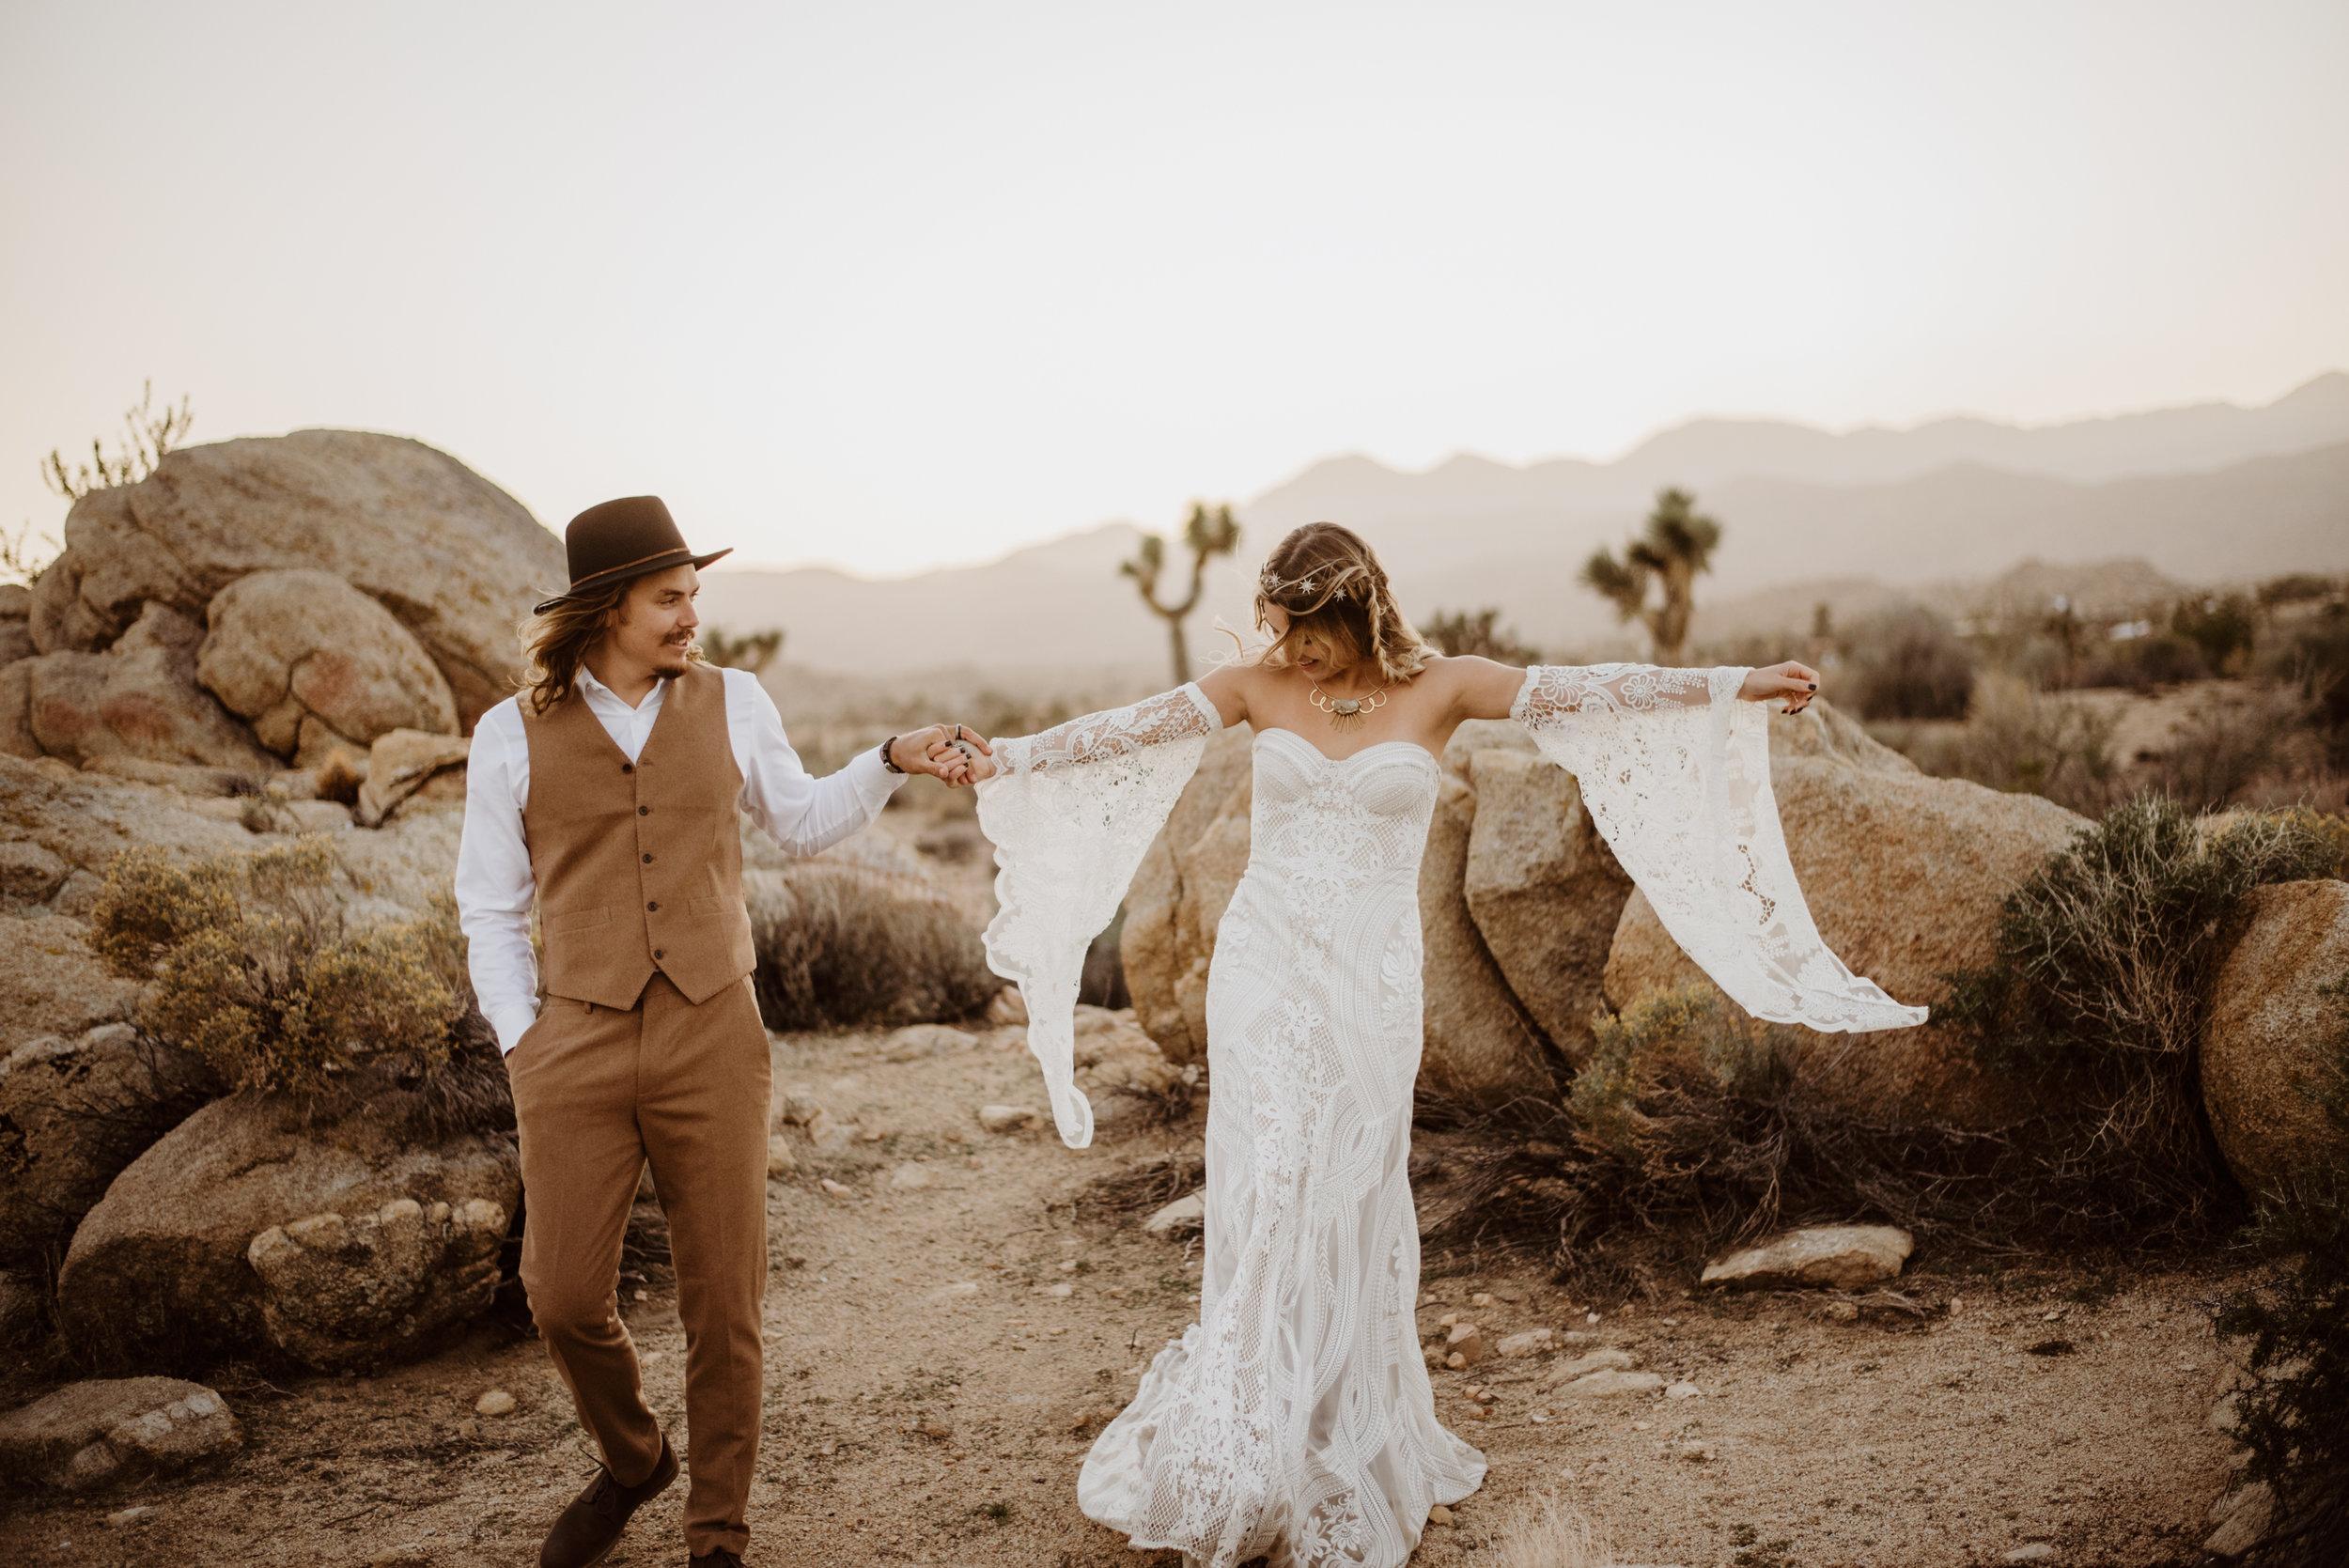 FortSt.John_photographer_TyraEPhotography_Wedding_Couple_Family_Photograhy_DawsonCreek_Elopement_Bride_Boduoir_Portraits-8743.jpg